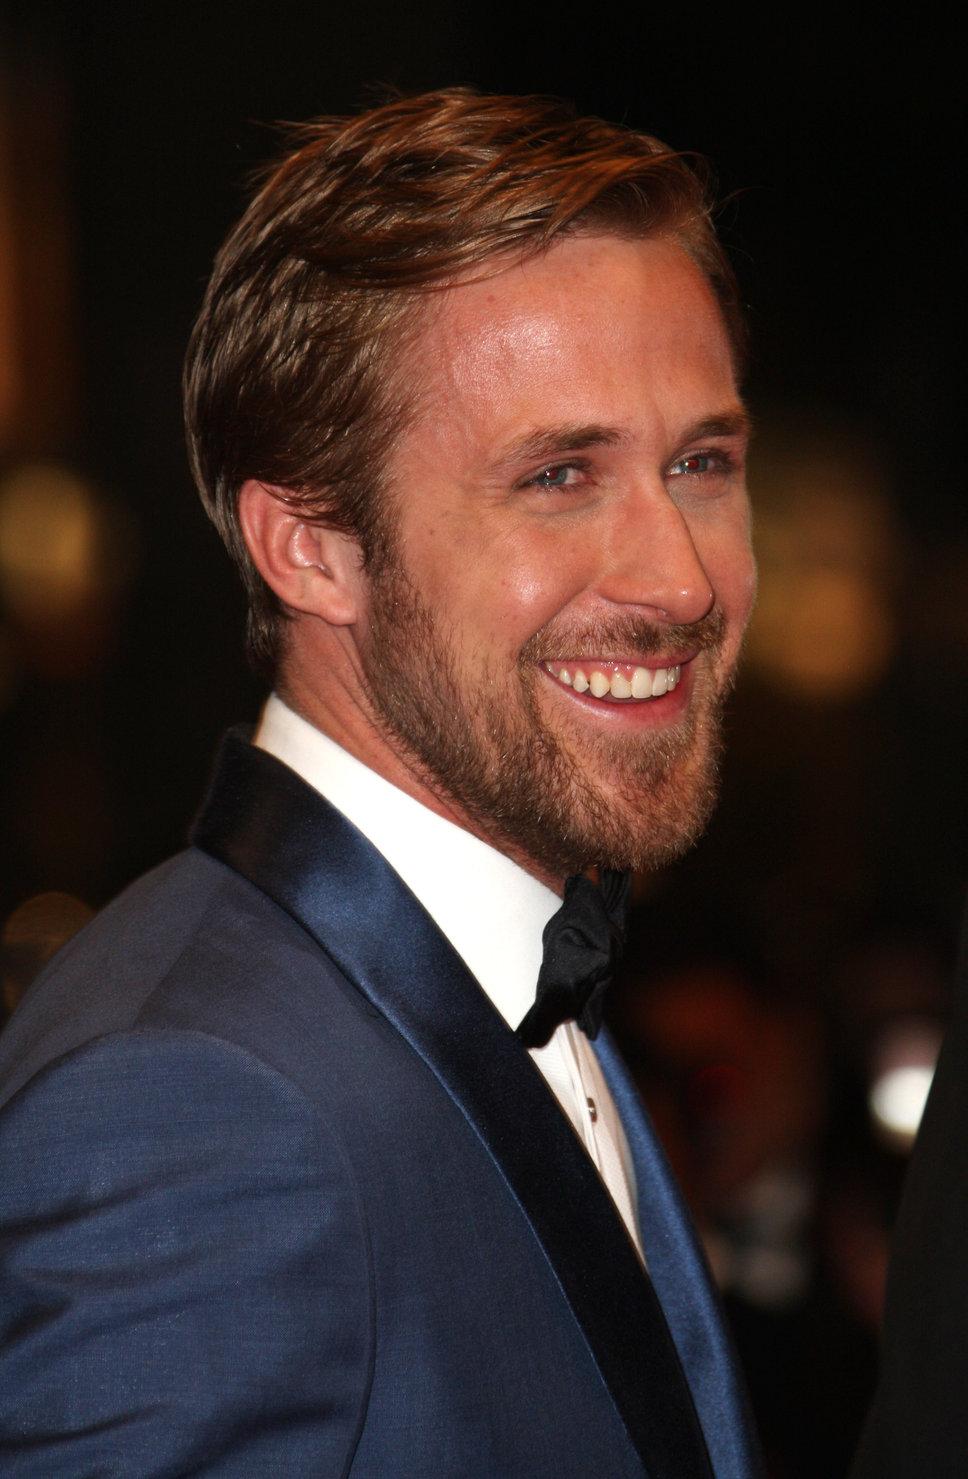 Ryan Gosling Christian Bale Steve Carell Cover New York: The Dirty, Pretty Little Thing